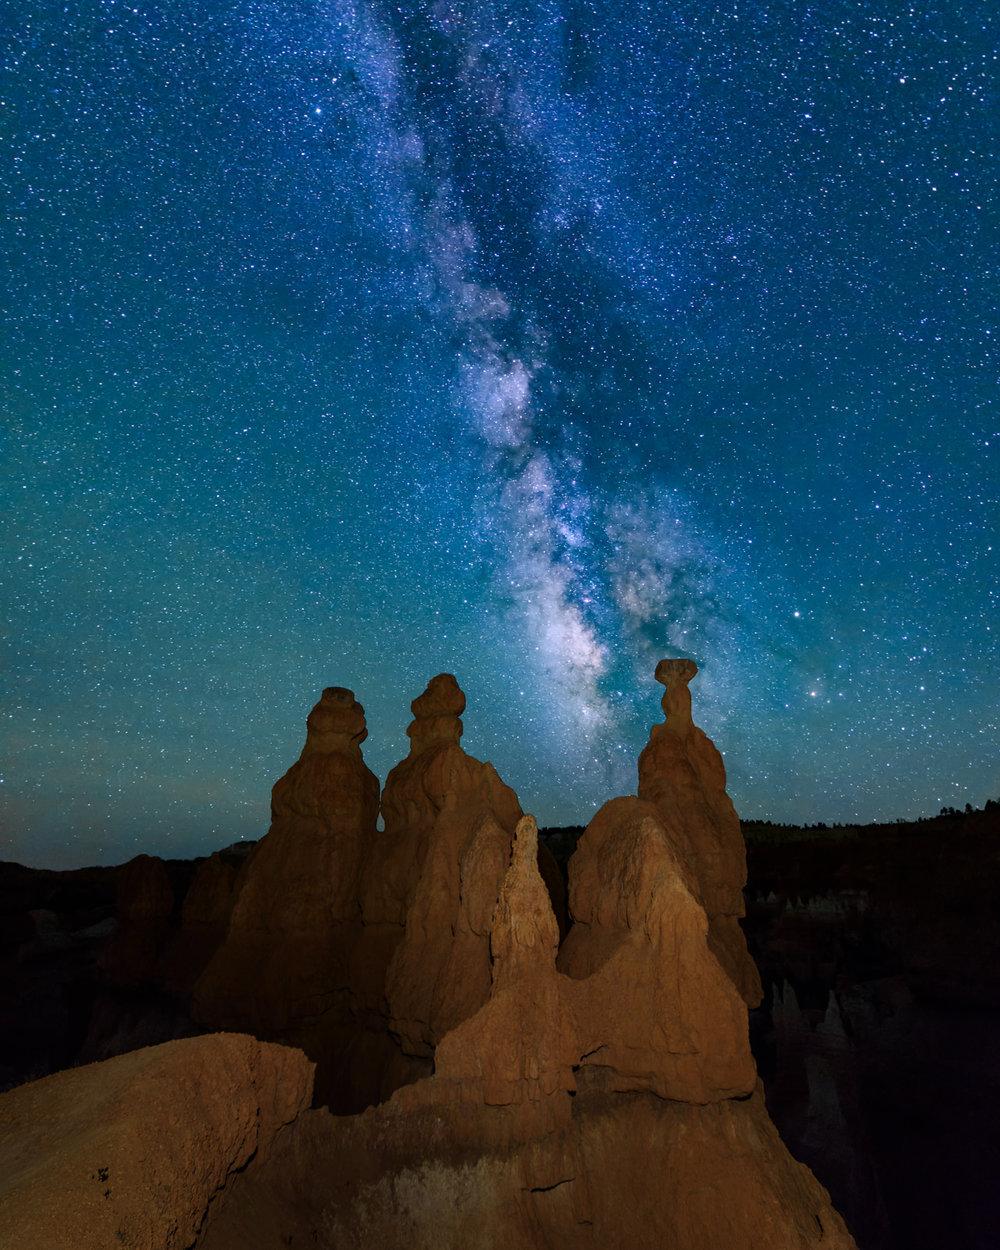 The Three Wisemen Watch the Milky Way